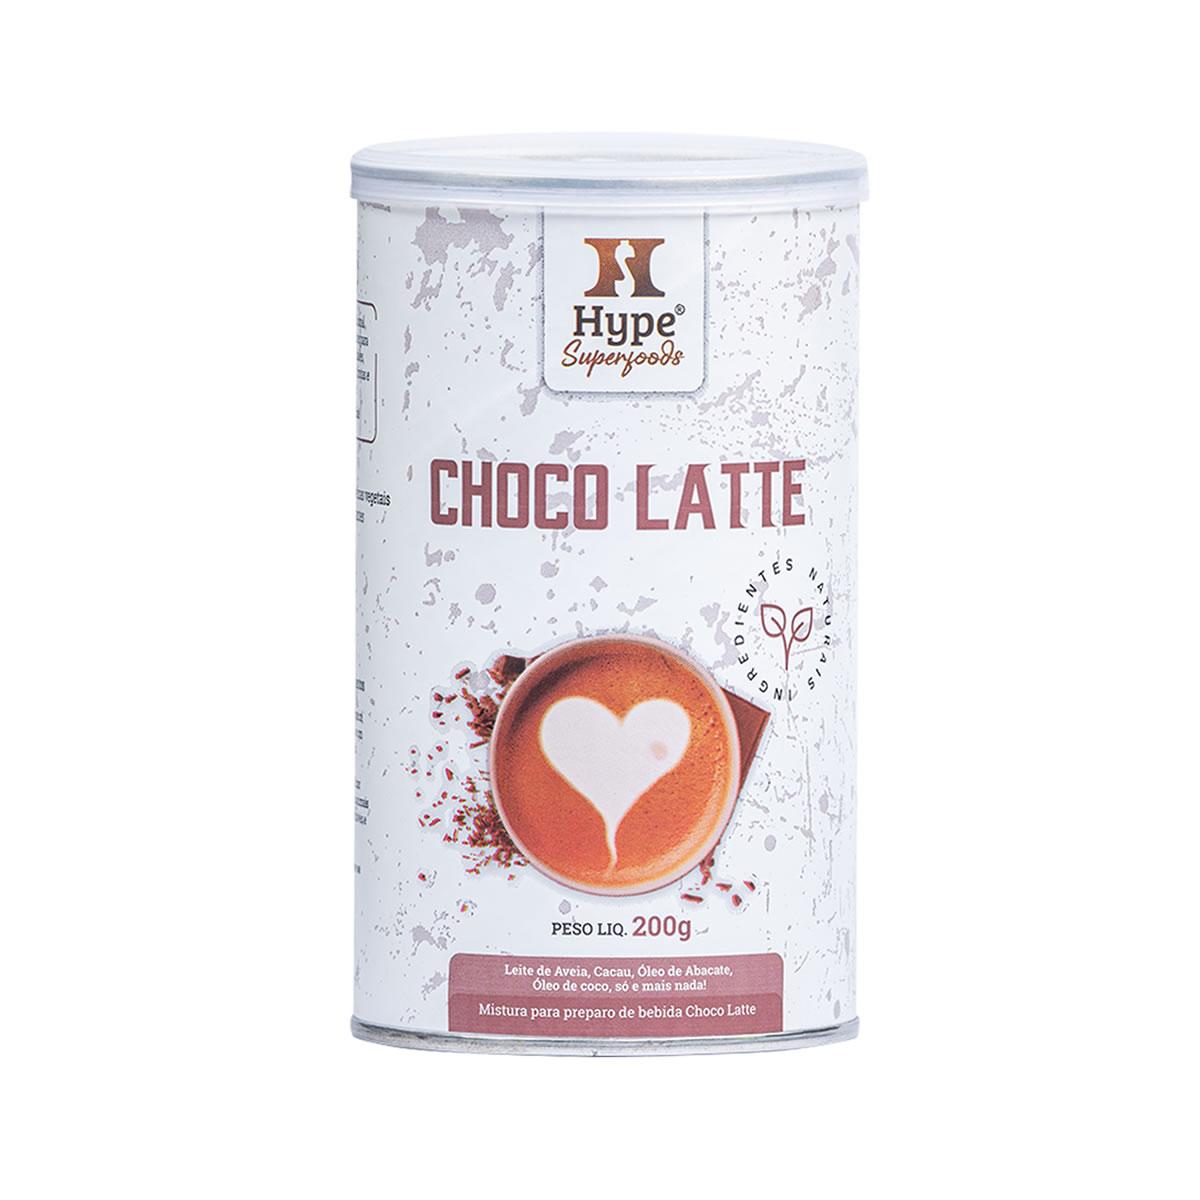 Mistura para preparo de Bebida Choco Latte 200g - Hype